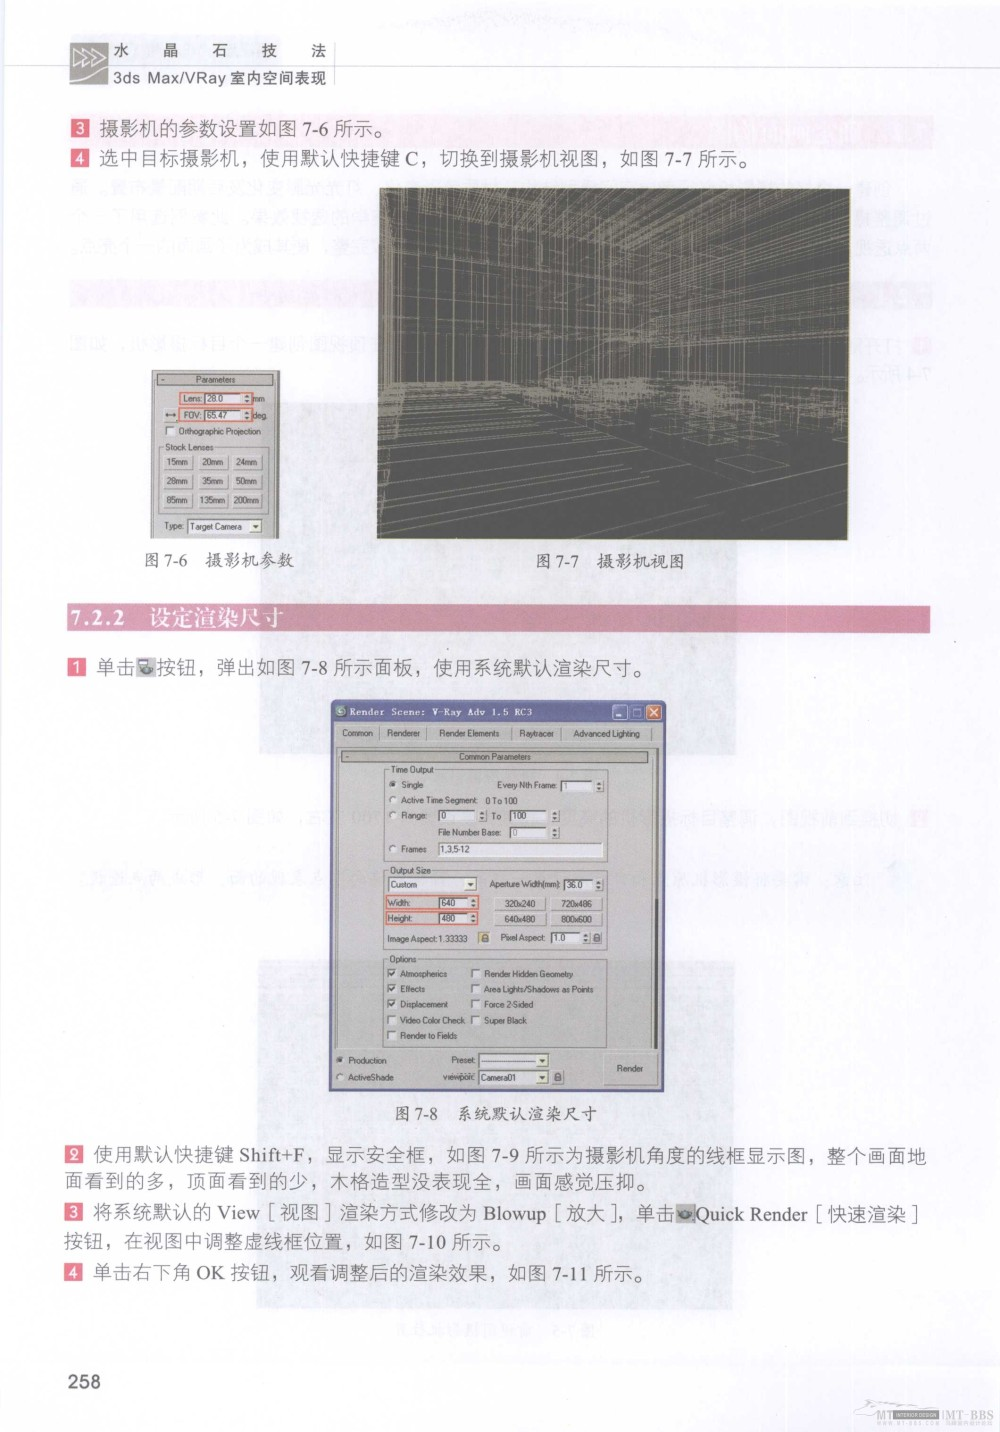 水晶石技法-3ds_Max&VRay室内空间表现_水晶石技法-3ds_Max&VRay室内空间表现_页面_264.jpg